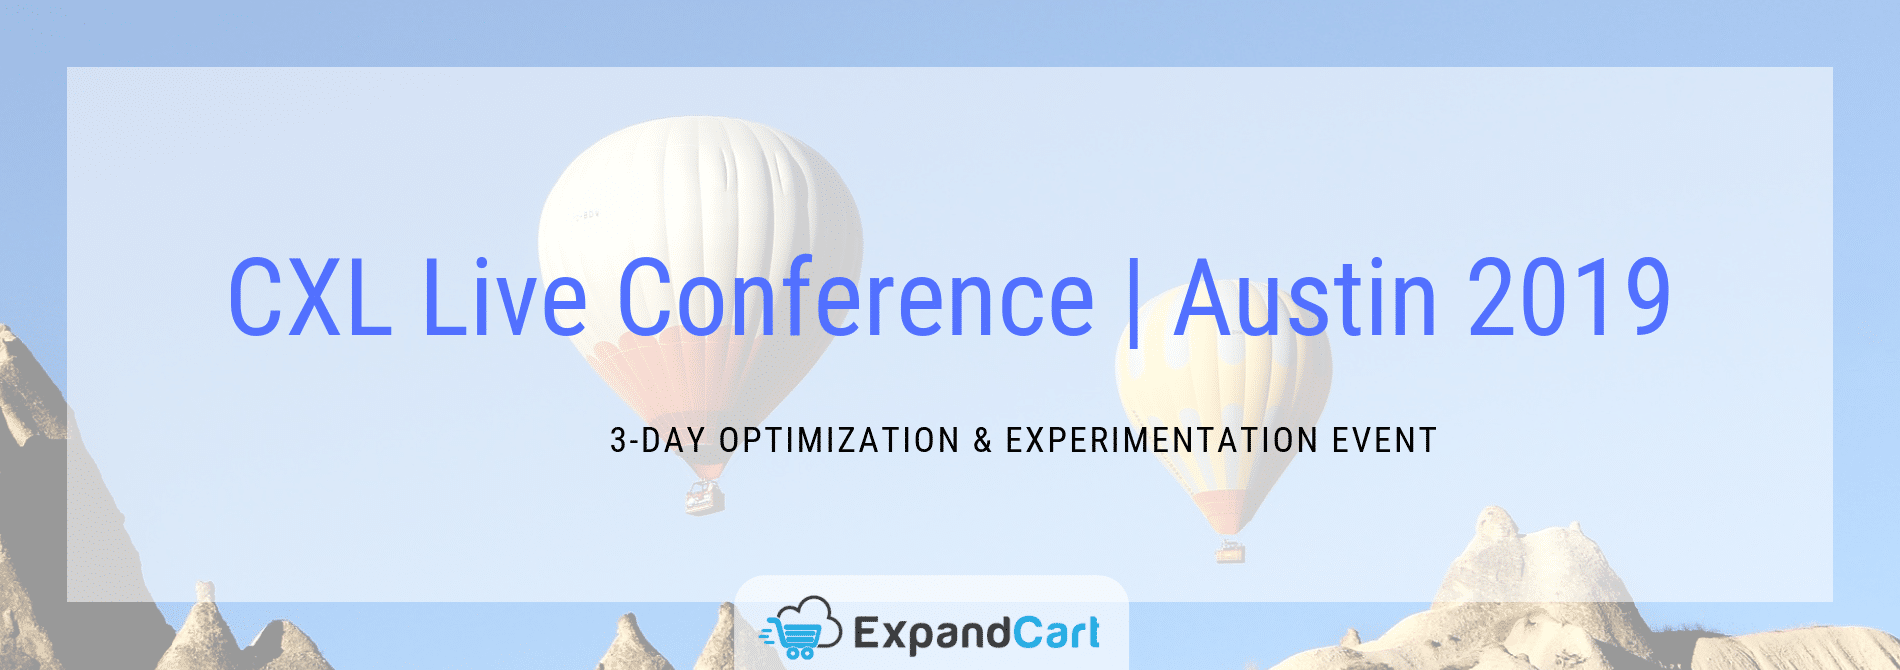 CXL Live Conference | Austin 2019.. 3-Day Optimization & Experimentation Event